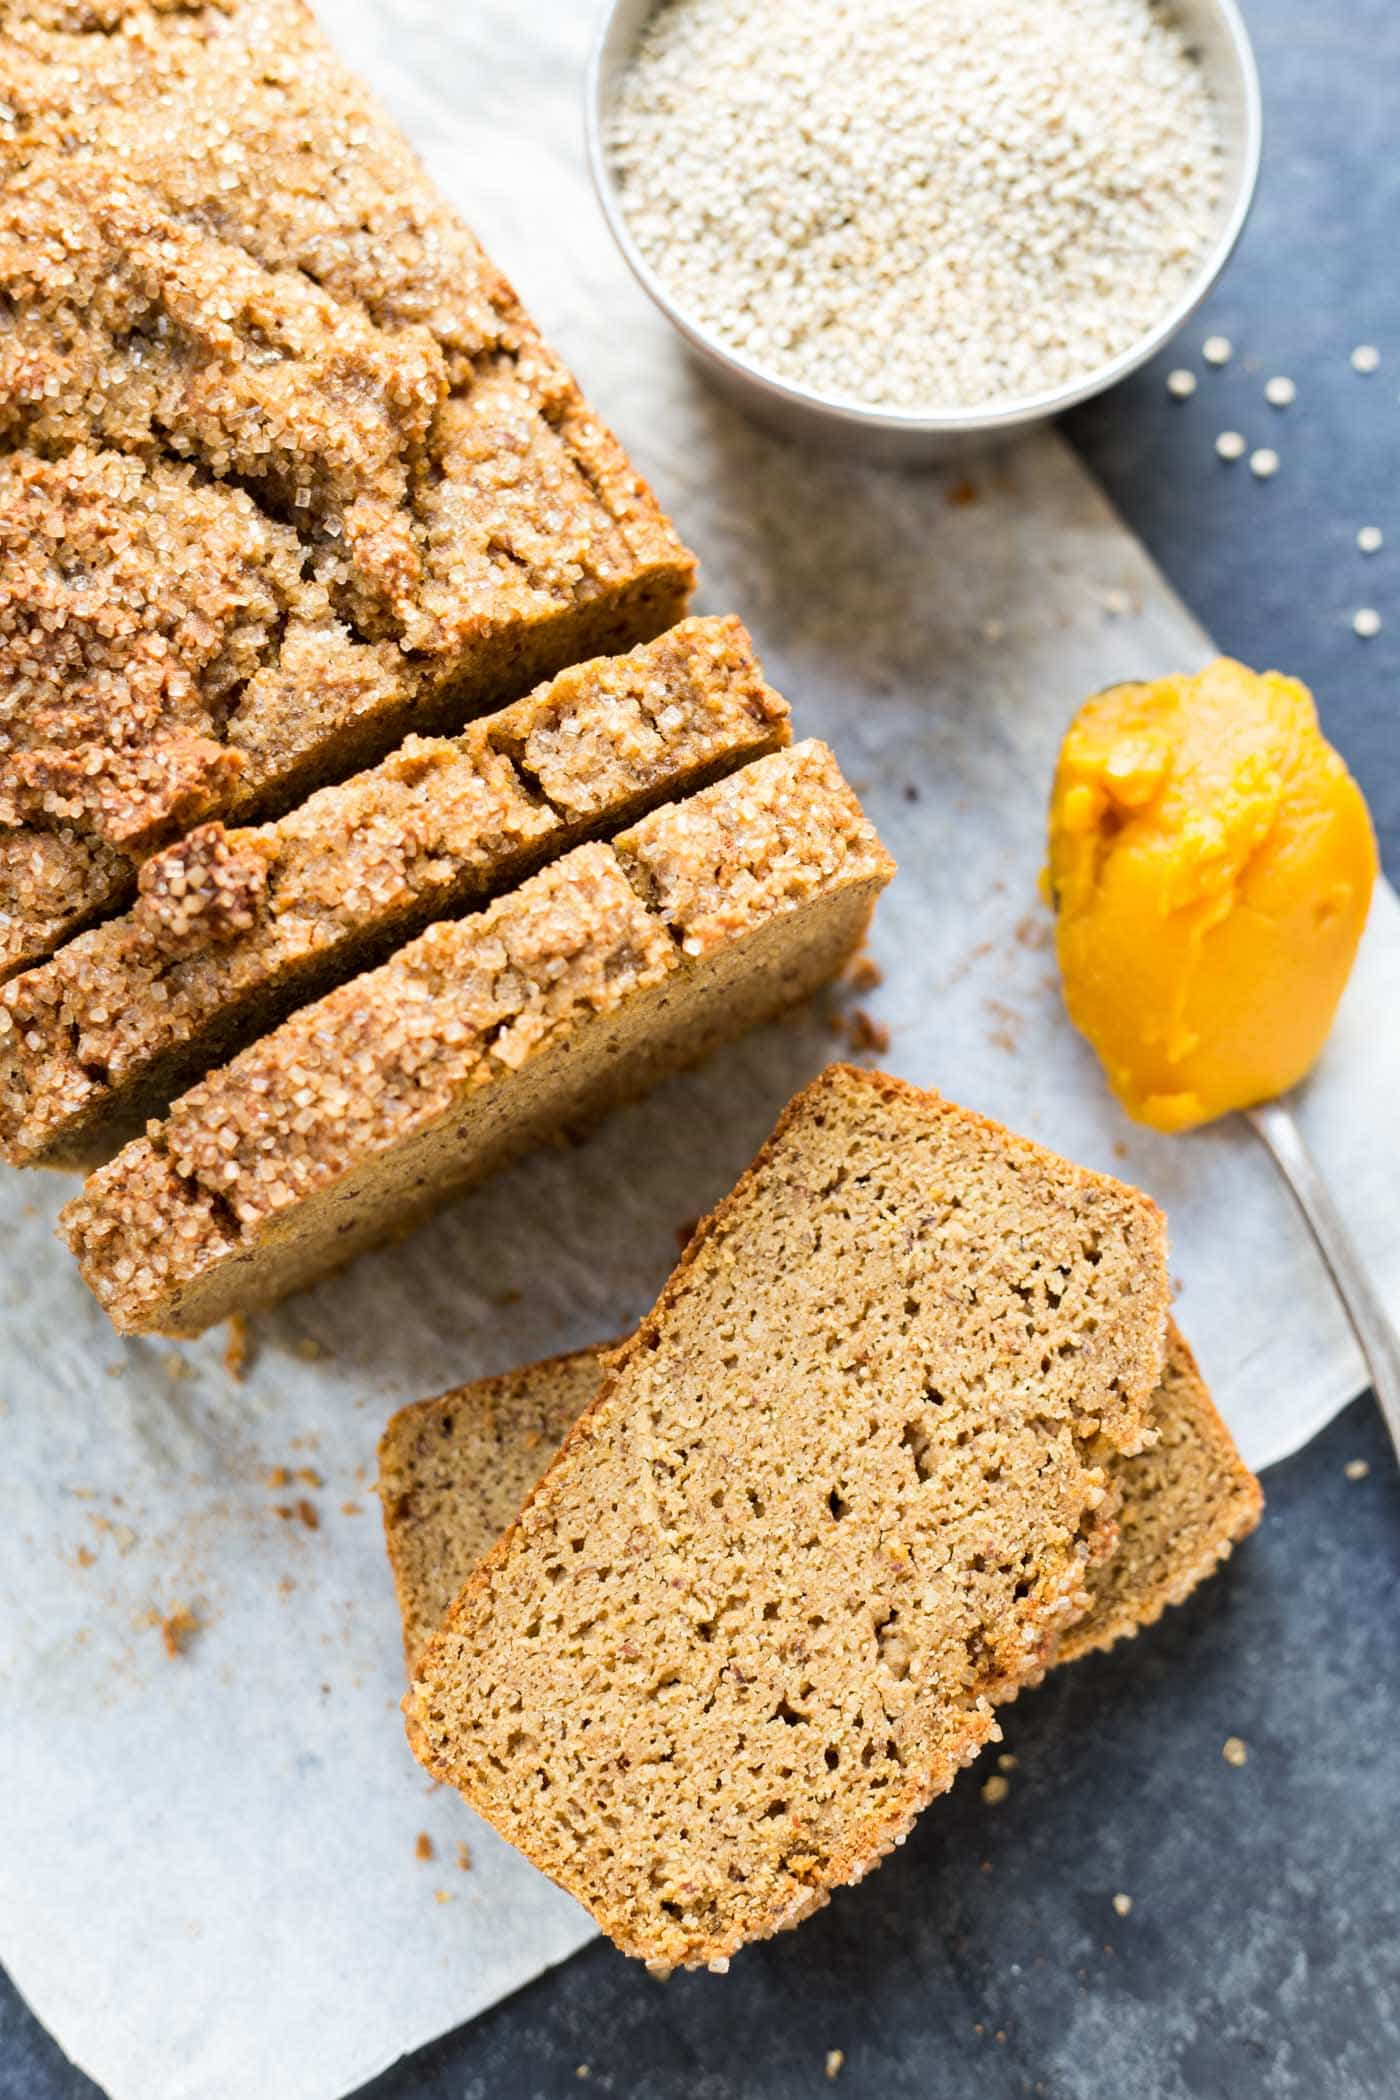 Quinoa + Almond Flour Pumpkin Bread -- a healthy spin on a classic recipe with 6g of protein + 3g of fiber PER SLICE!